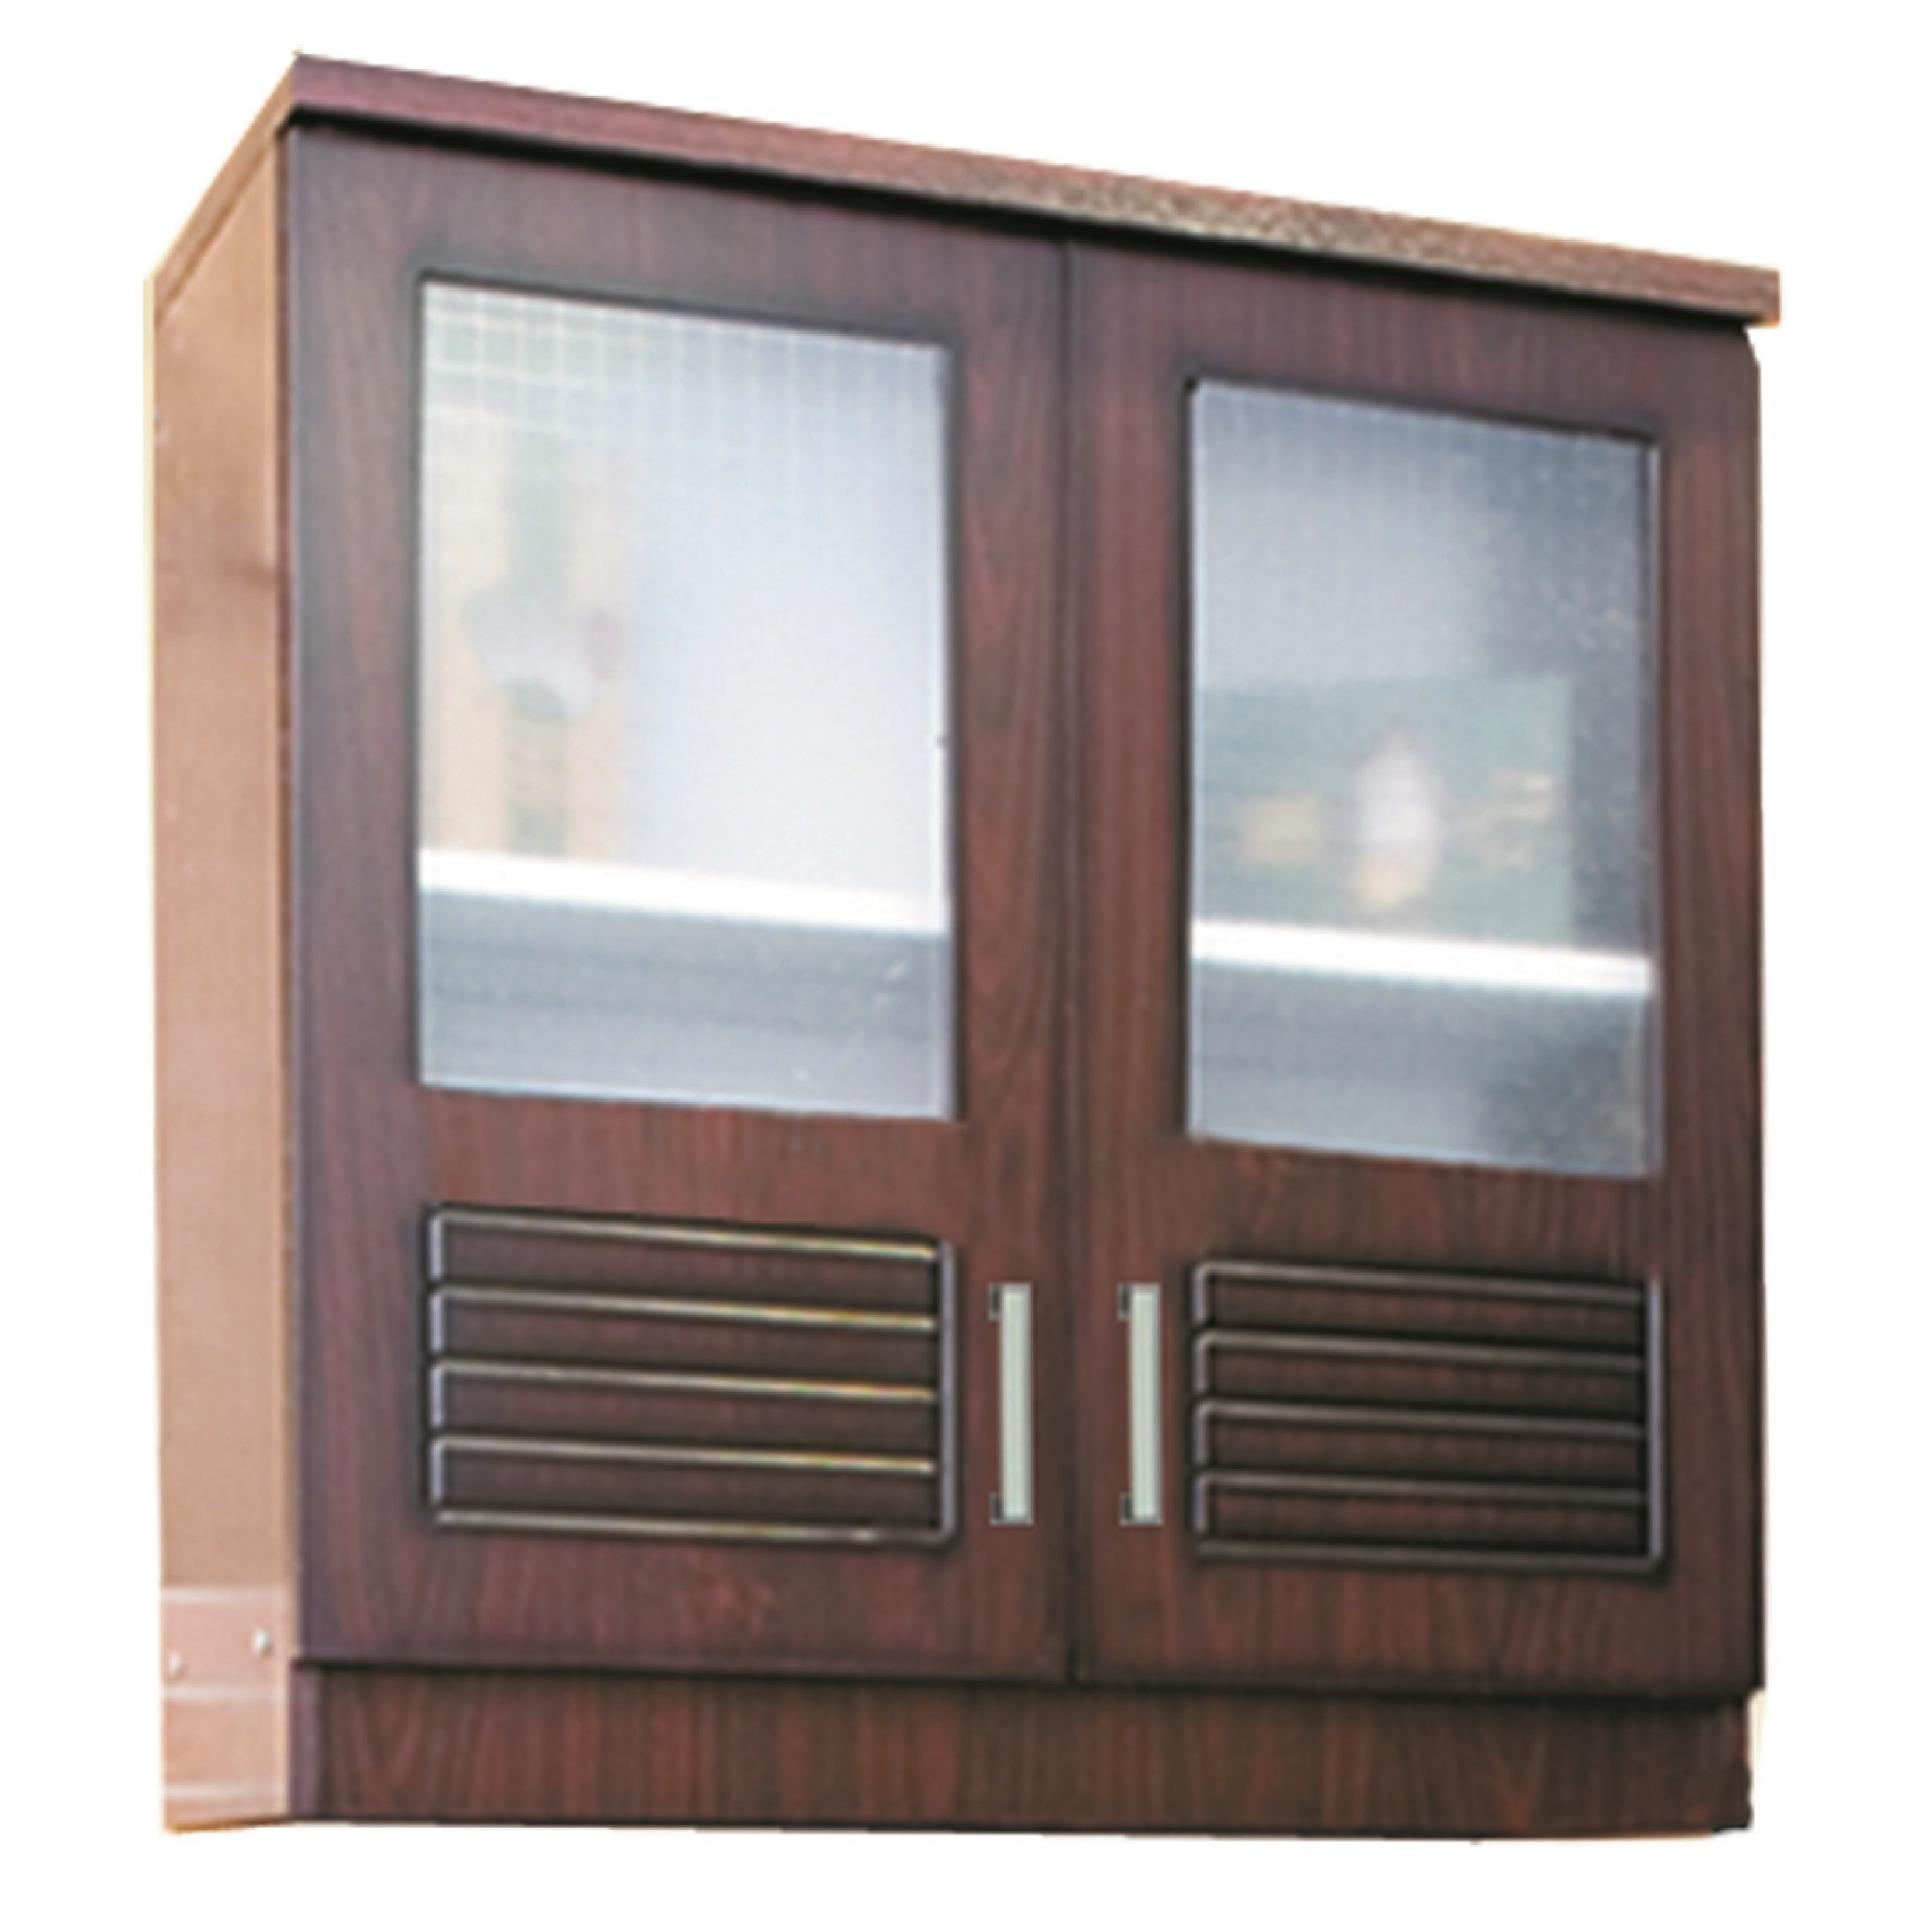 Cek Harga Baru Kirana Kitchen Set Lemari Atas 2 Pintu Kaca Uk 902